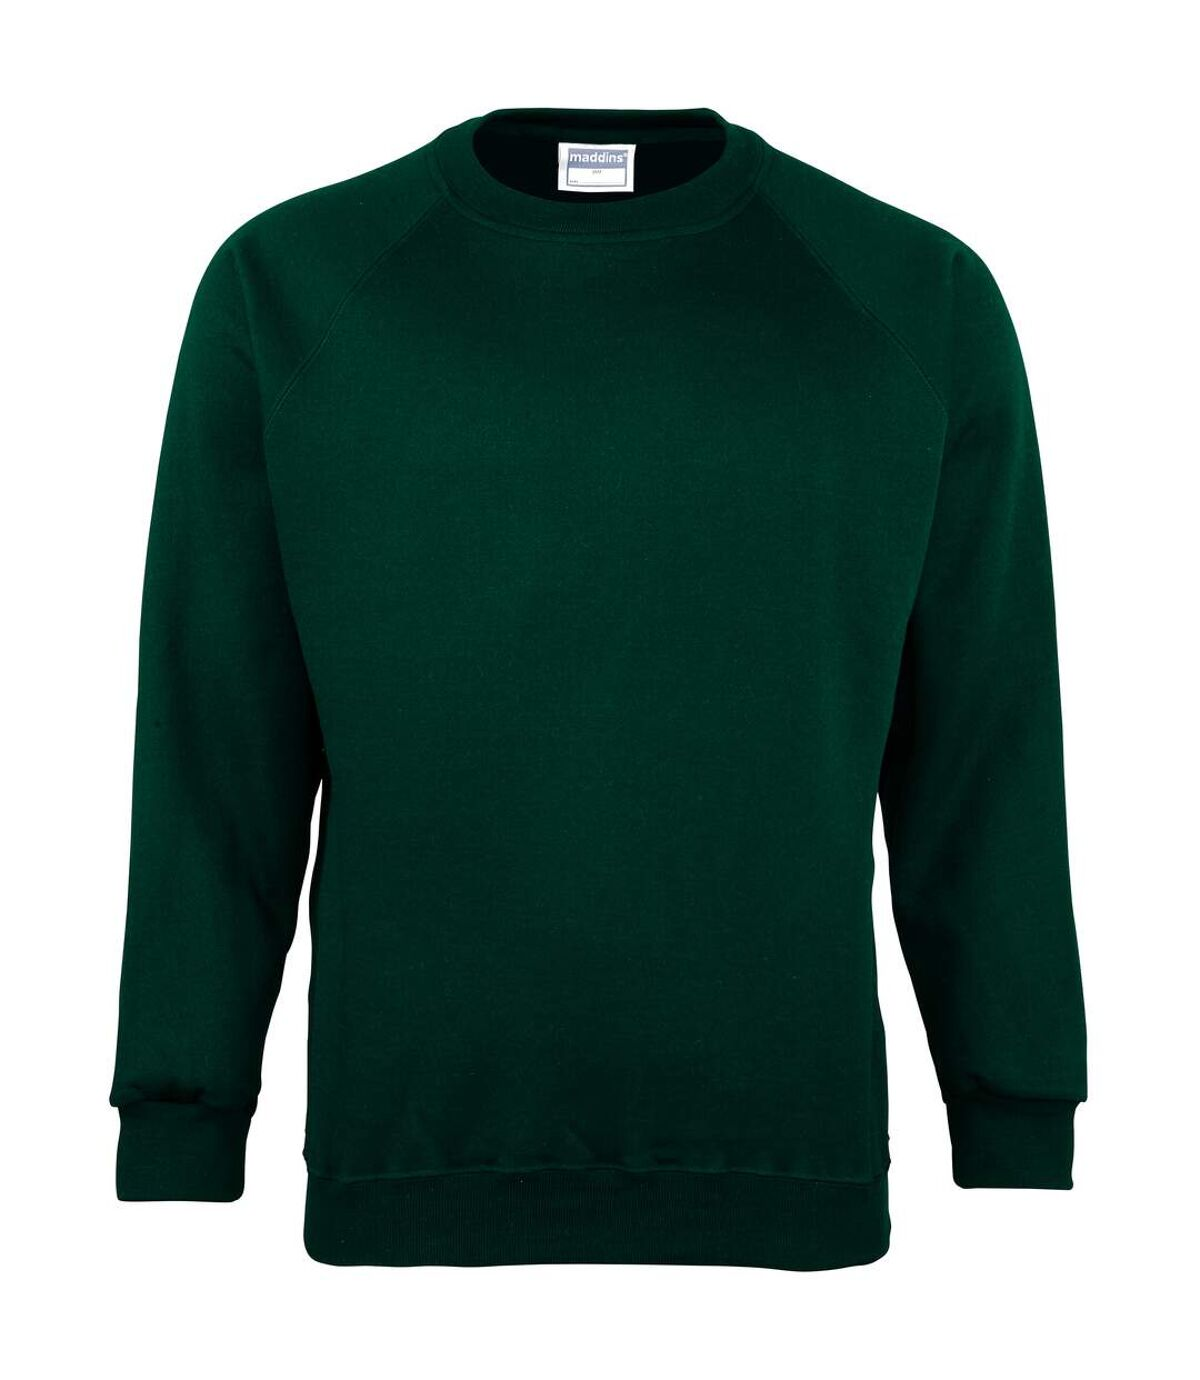 Maddins - Sweatshirt - Homme (Noir) - UTRW842